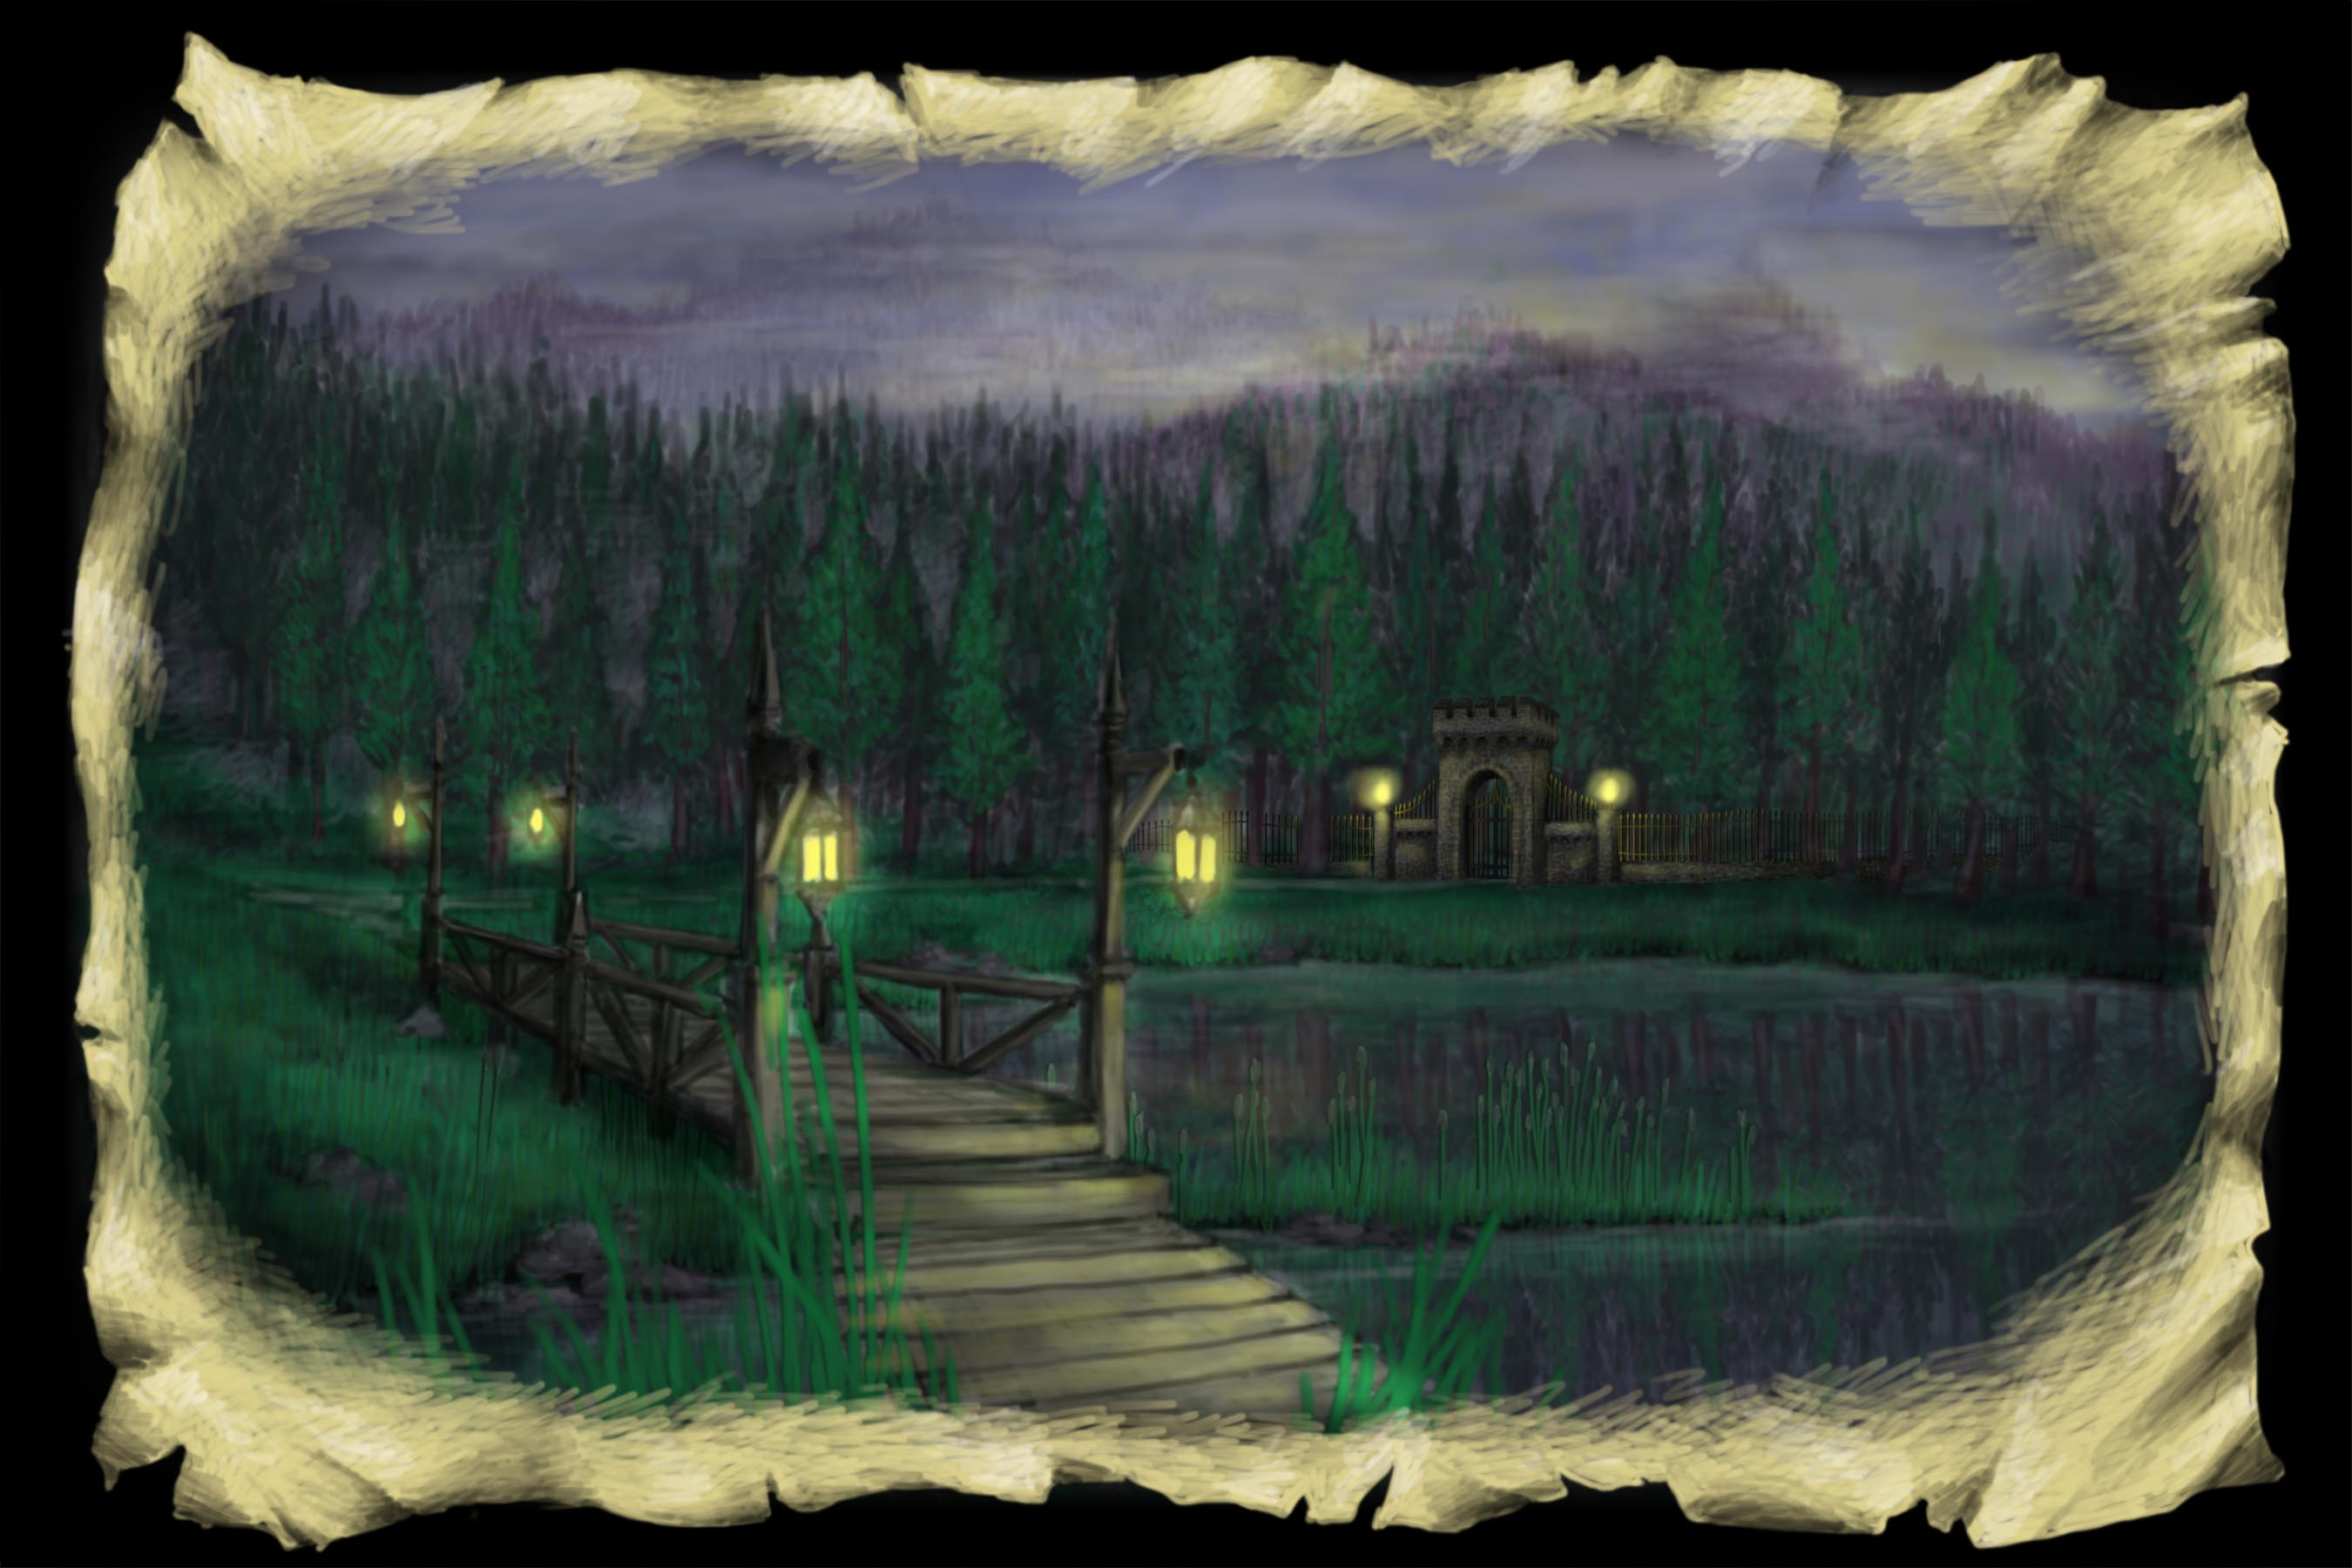 Scene 1. Lake and Bridge, Night Time